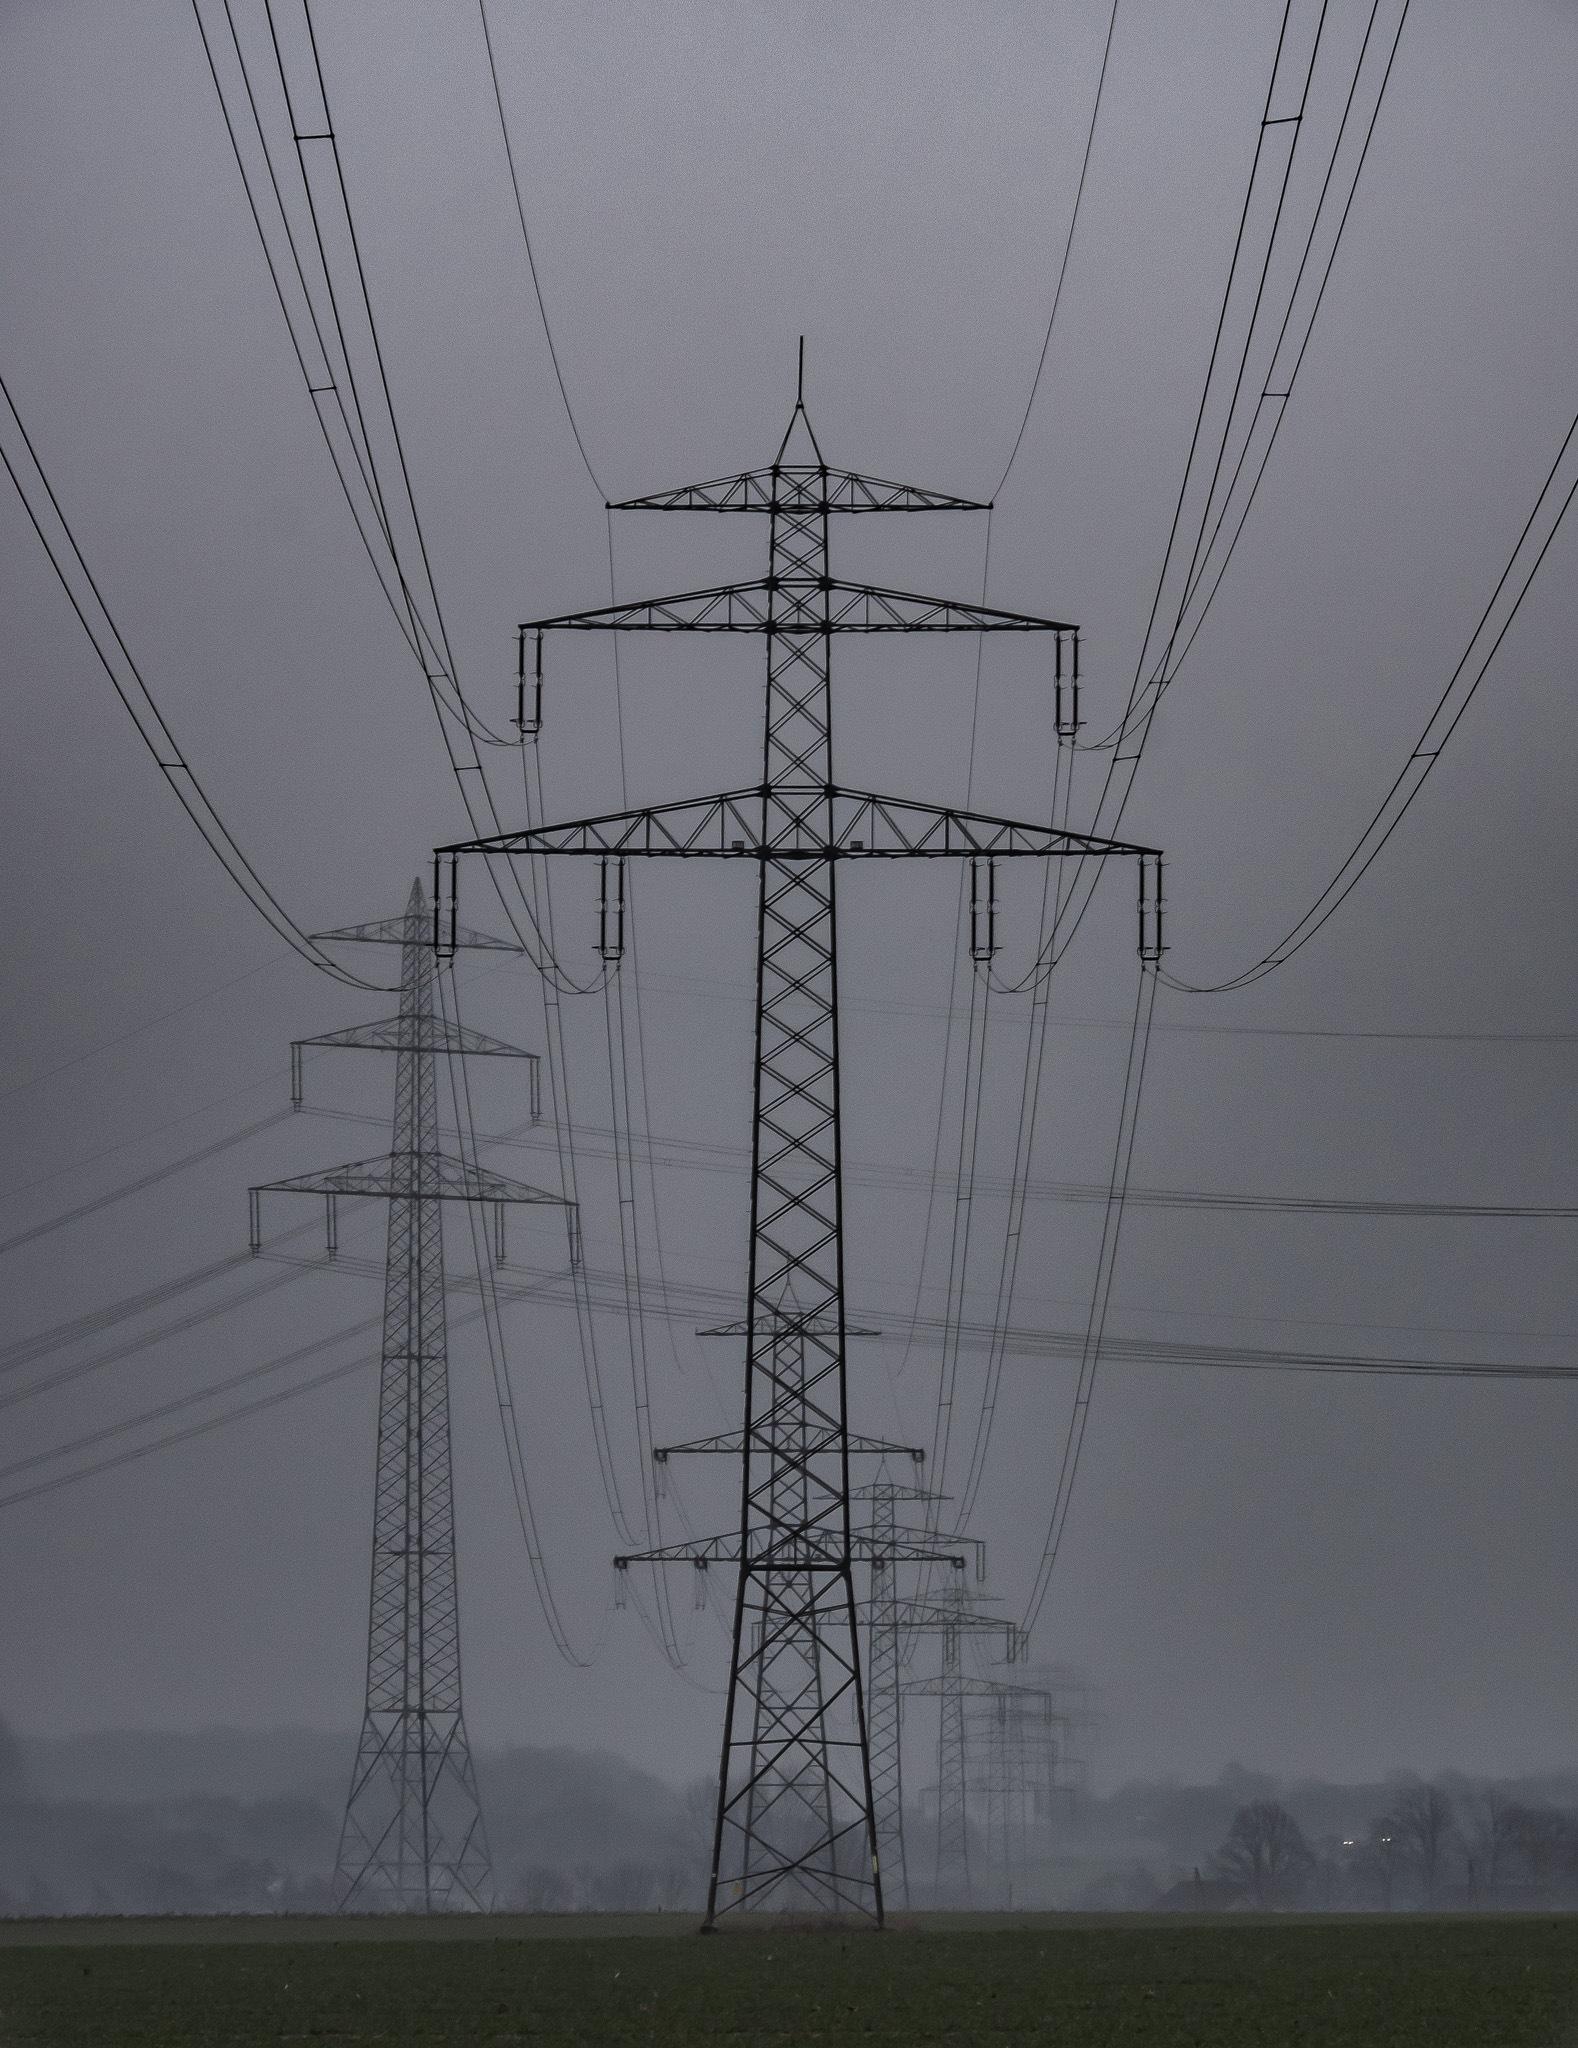 Power Lines by JohannesTonn